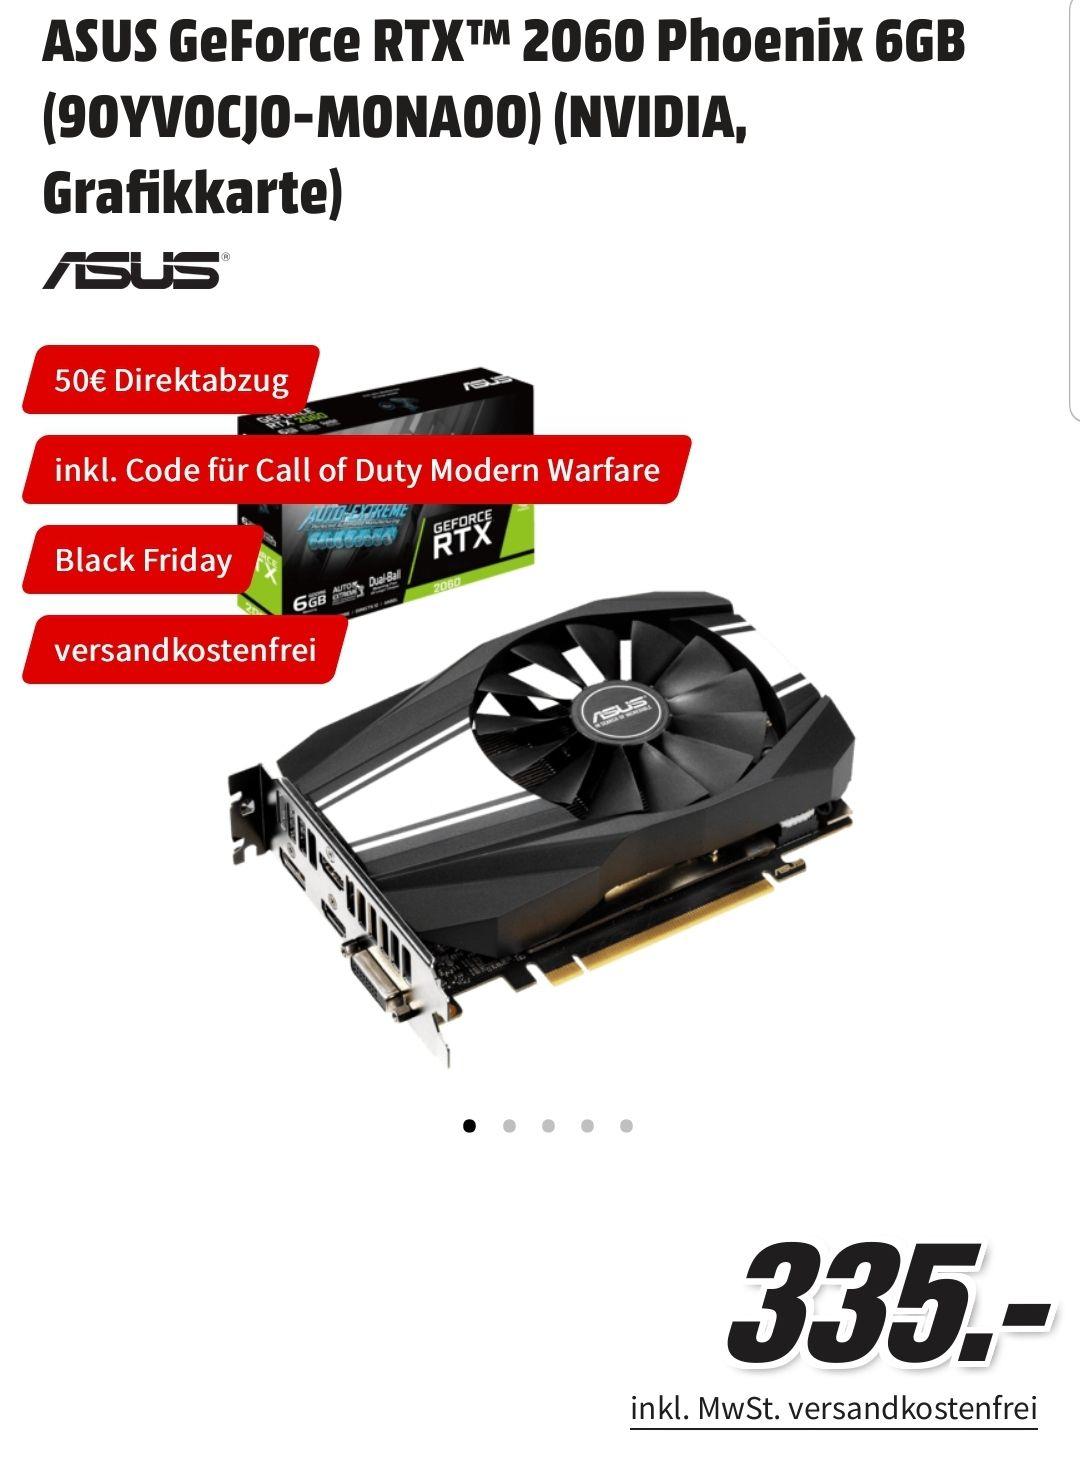 ASUS GeForce RTX 2060 Phoenix 6GB (Paydirekt)